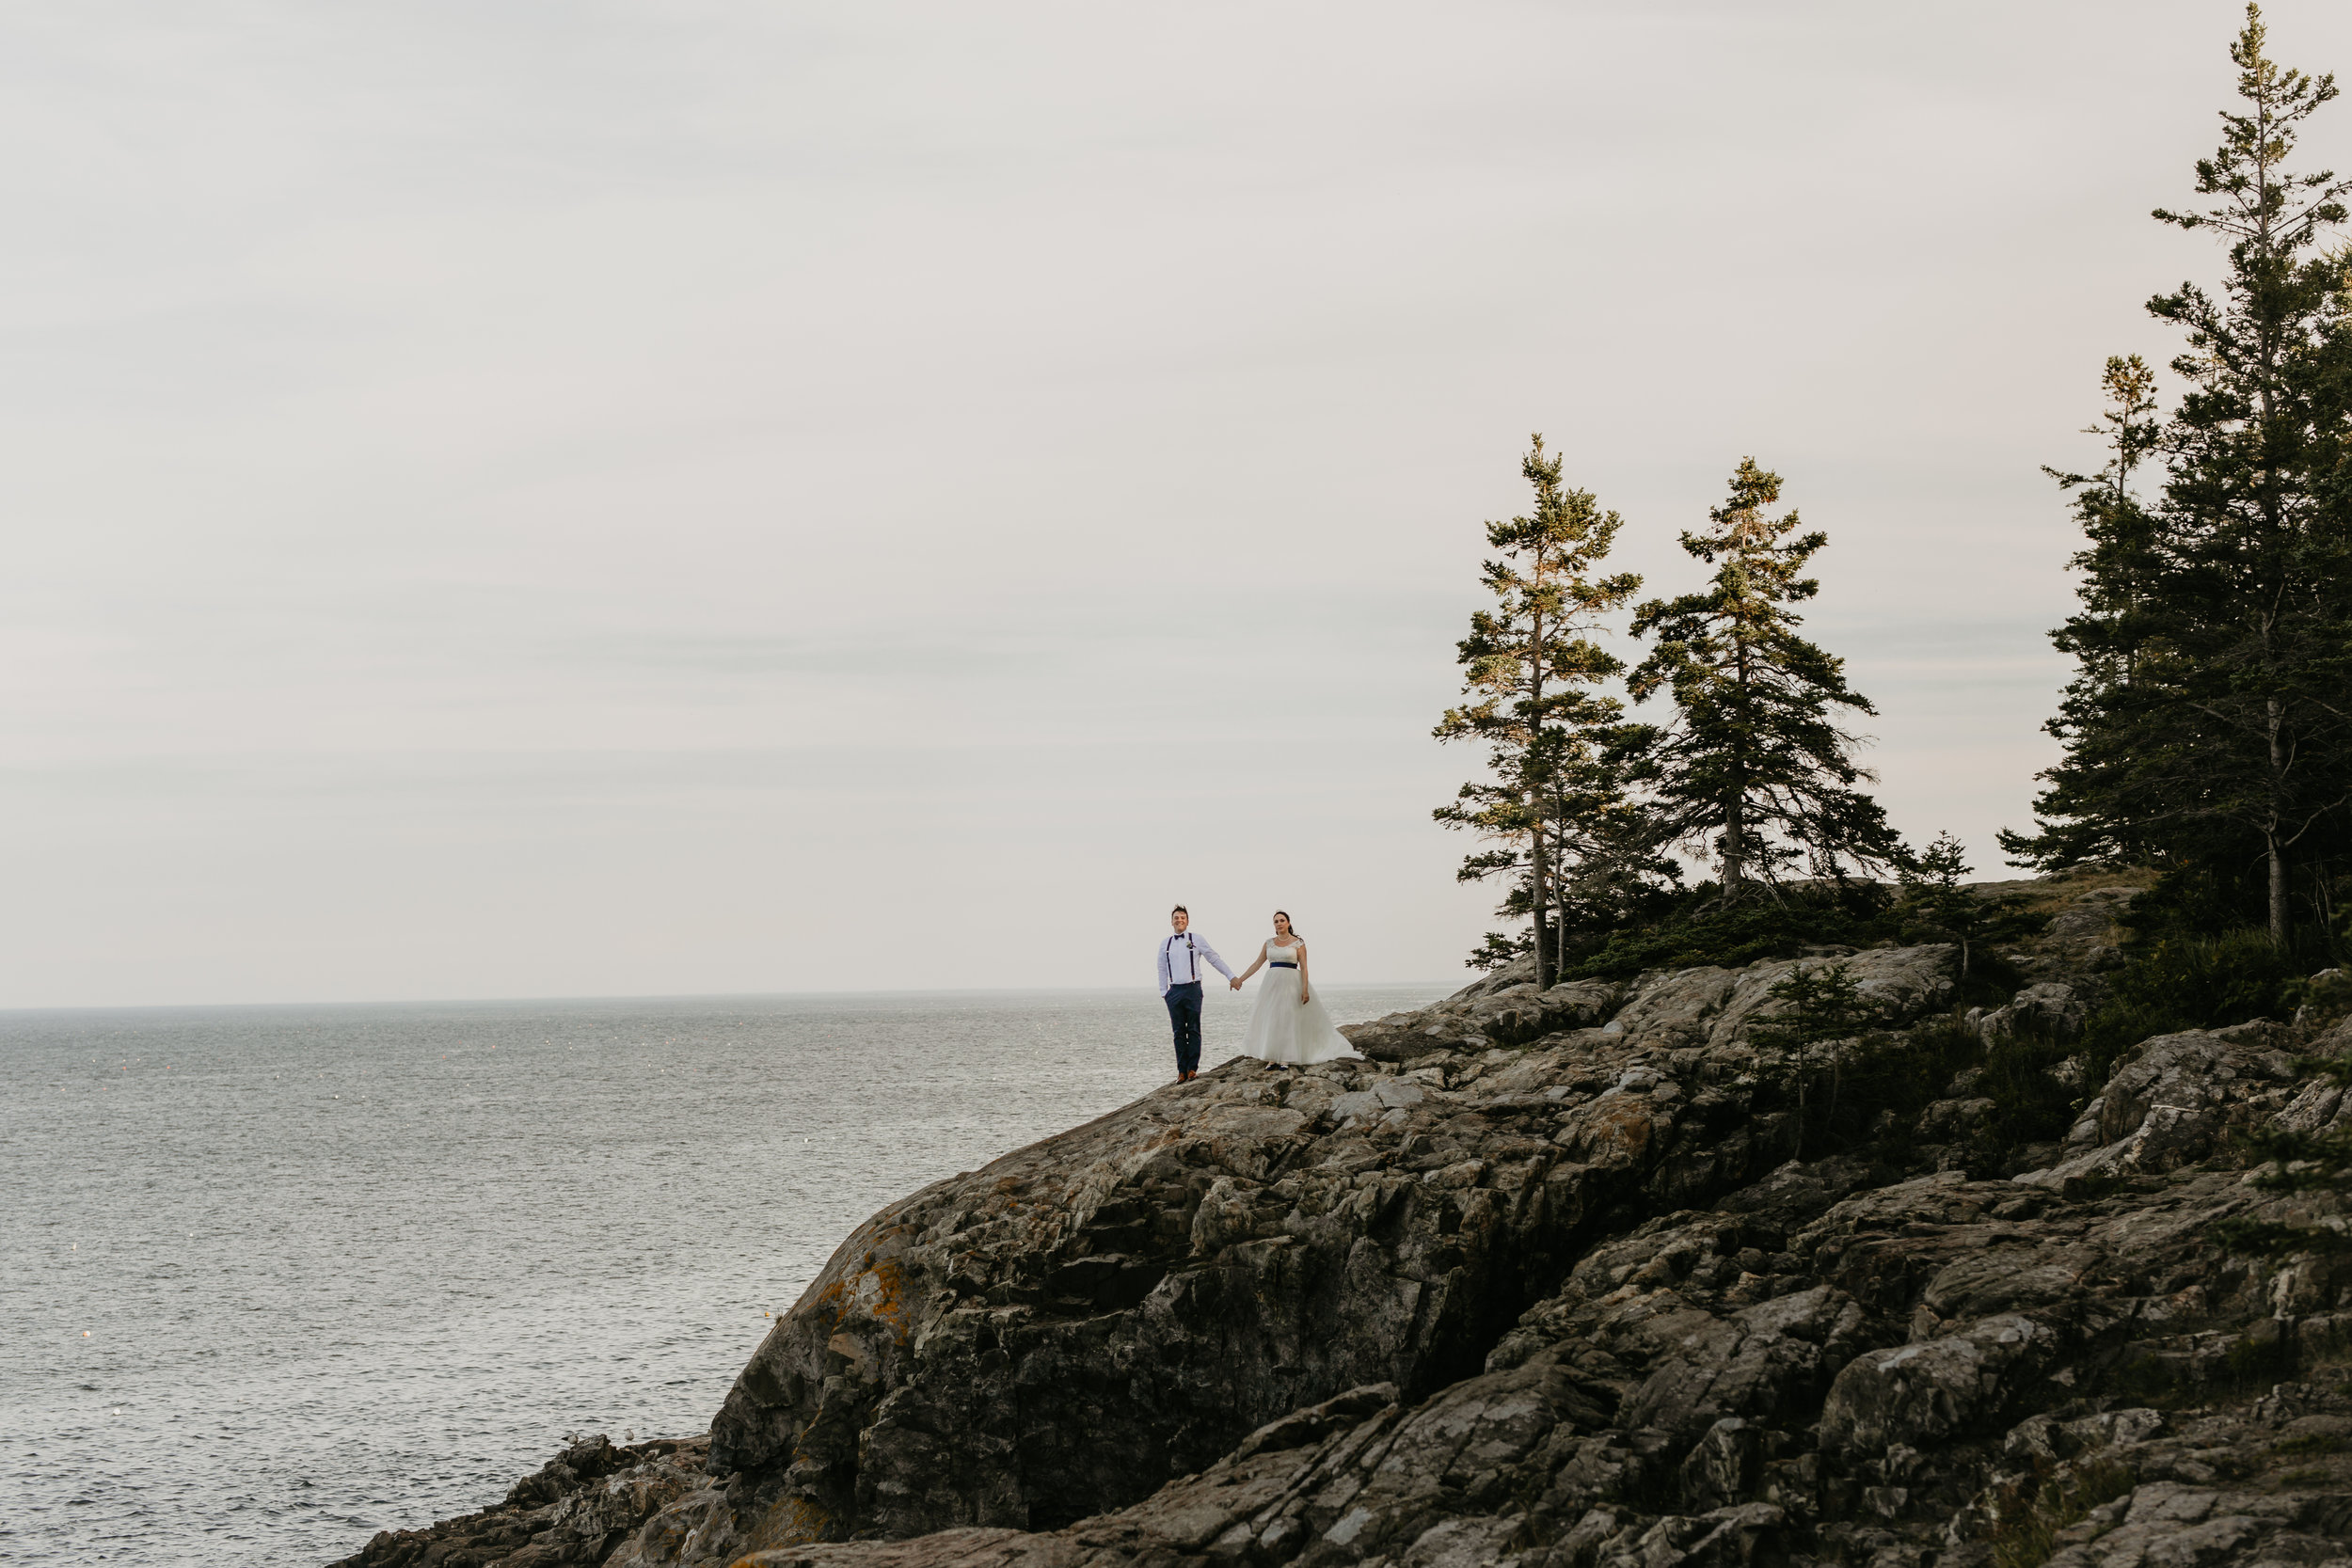 nicole-daacke-photography-Elopement-rocky-shoreline-coast-Acadia-National-Park-elopement-photographer-inspiration-maine-elopement-otter-cliffs-schoonic-head-point-41.jpg